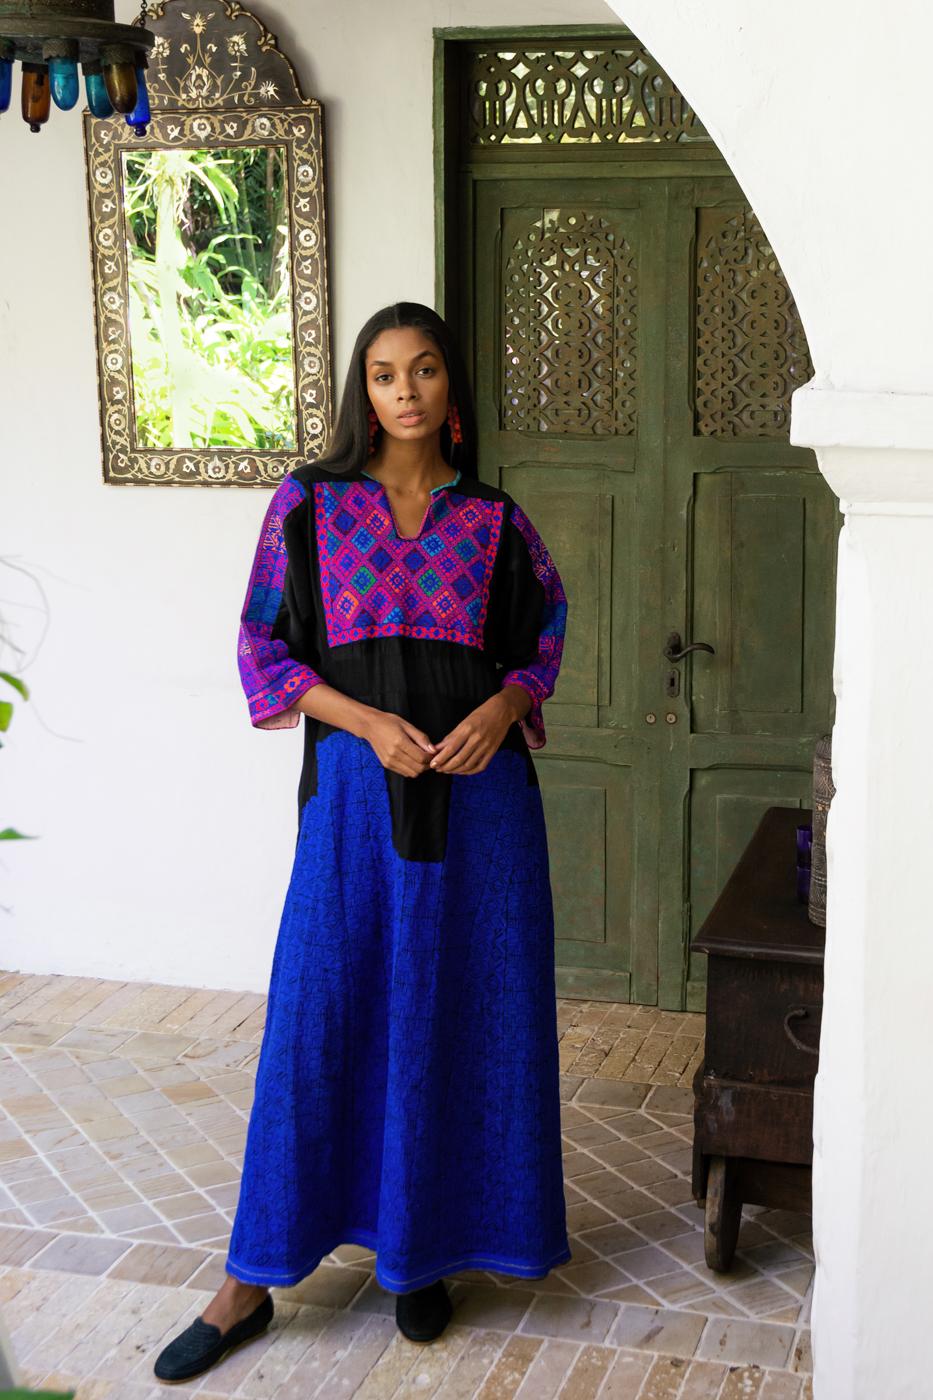 Egyptian kaftan with ethnic embroidery - purple